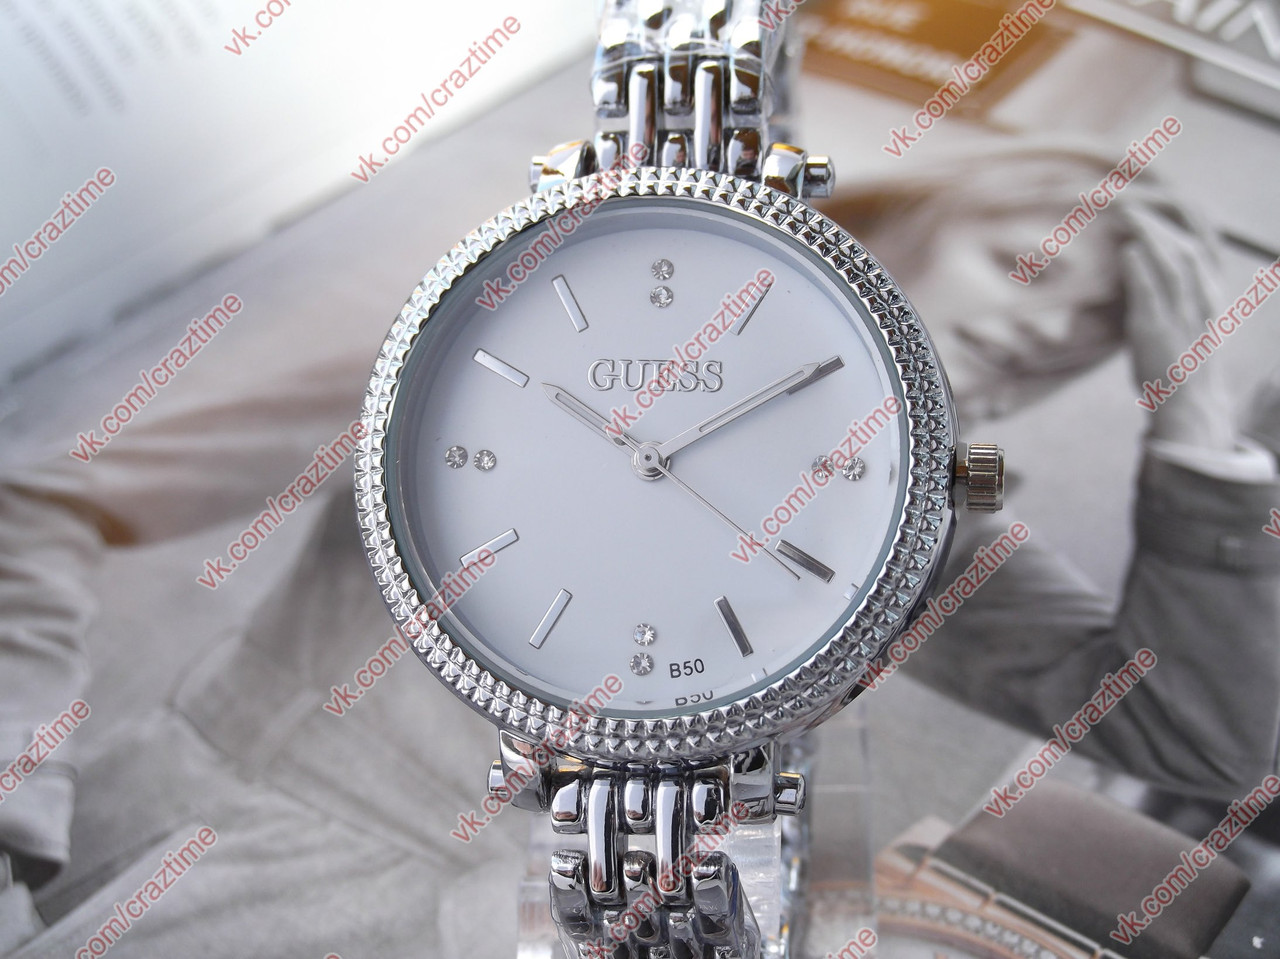 1eb367ce Женские кварцевые наручные часы Guess B50 (448210402). Цена, купить ...